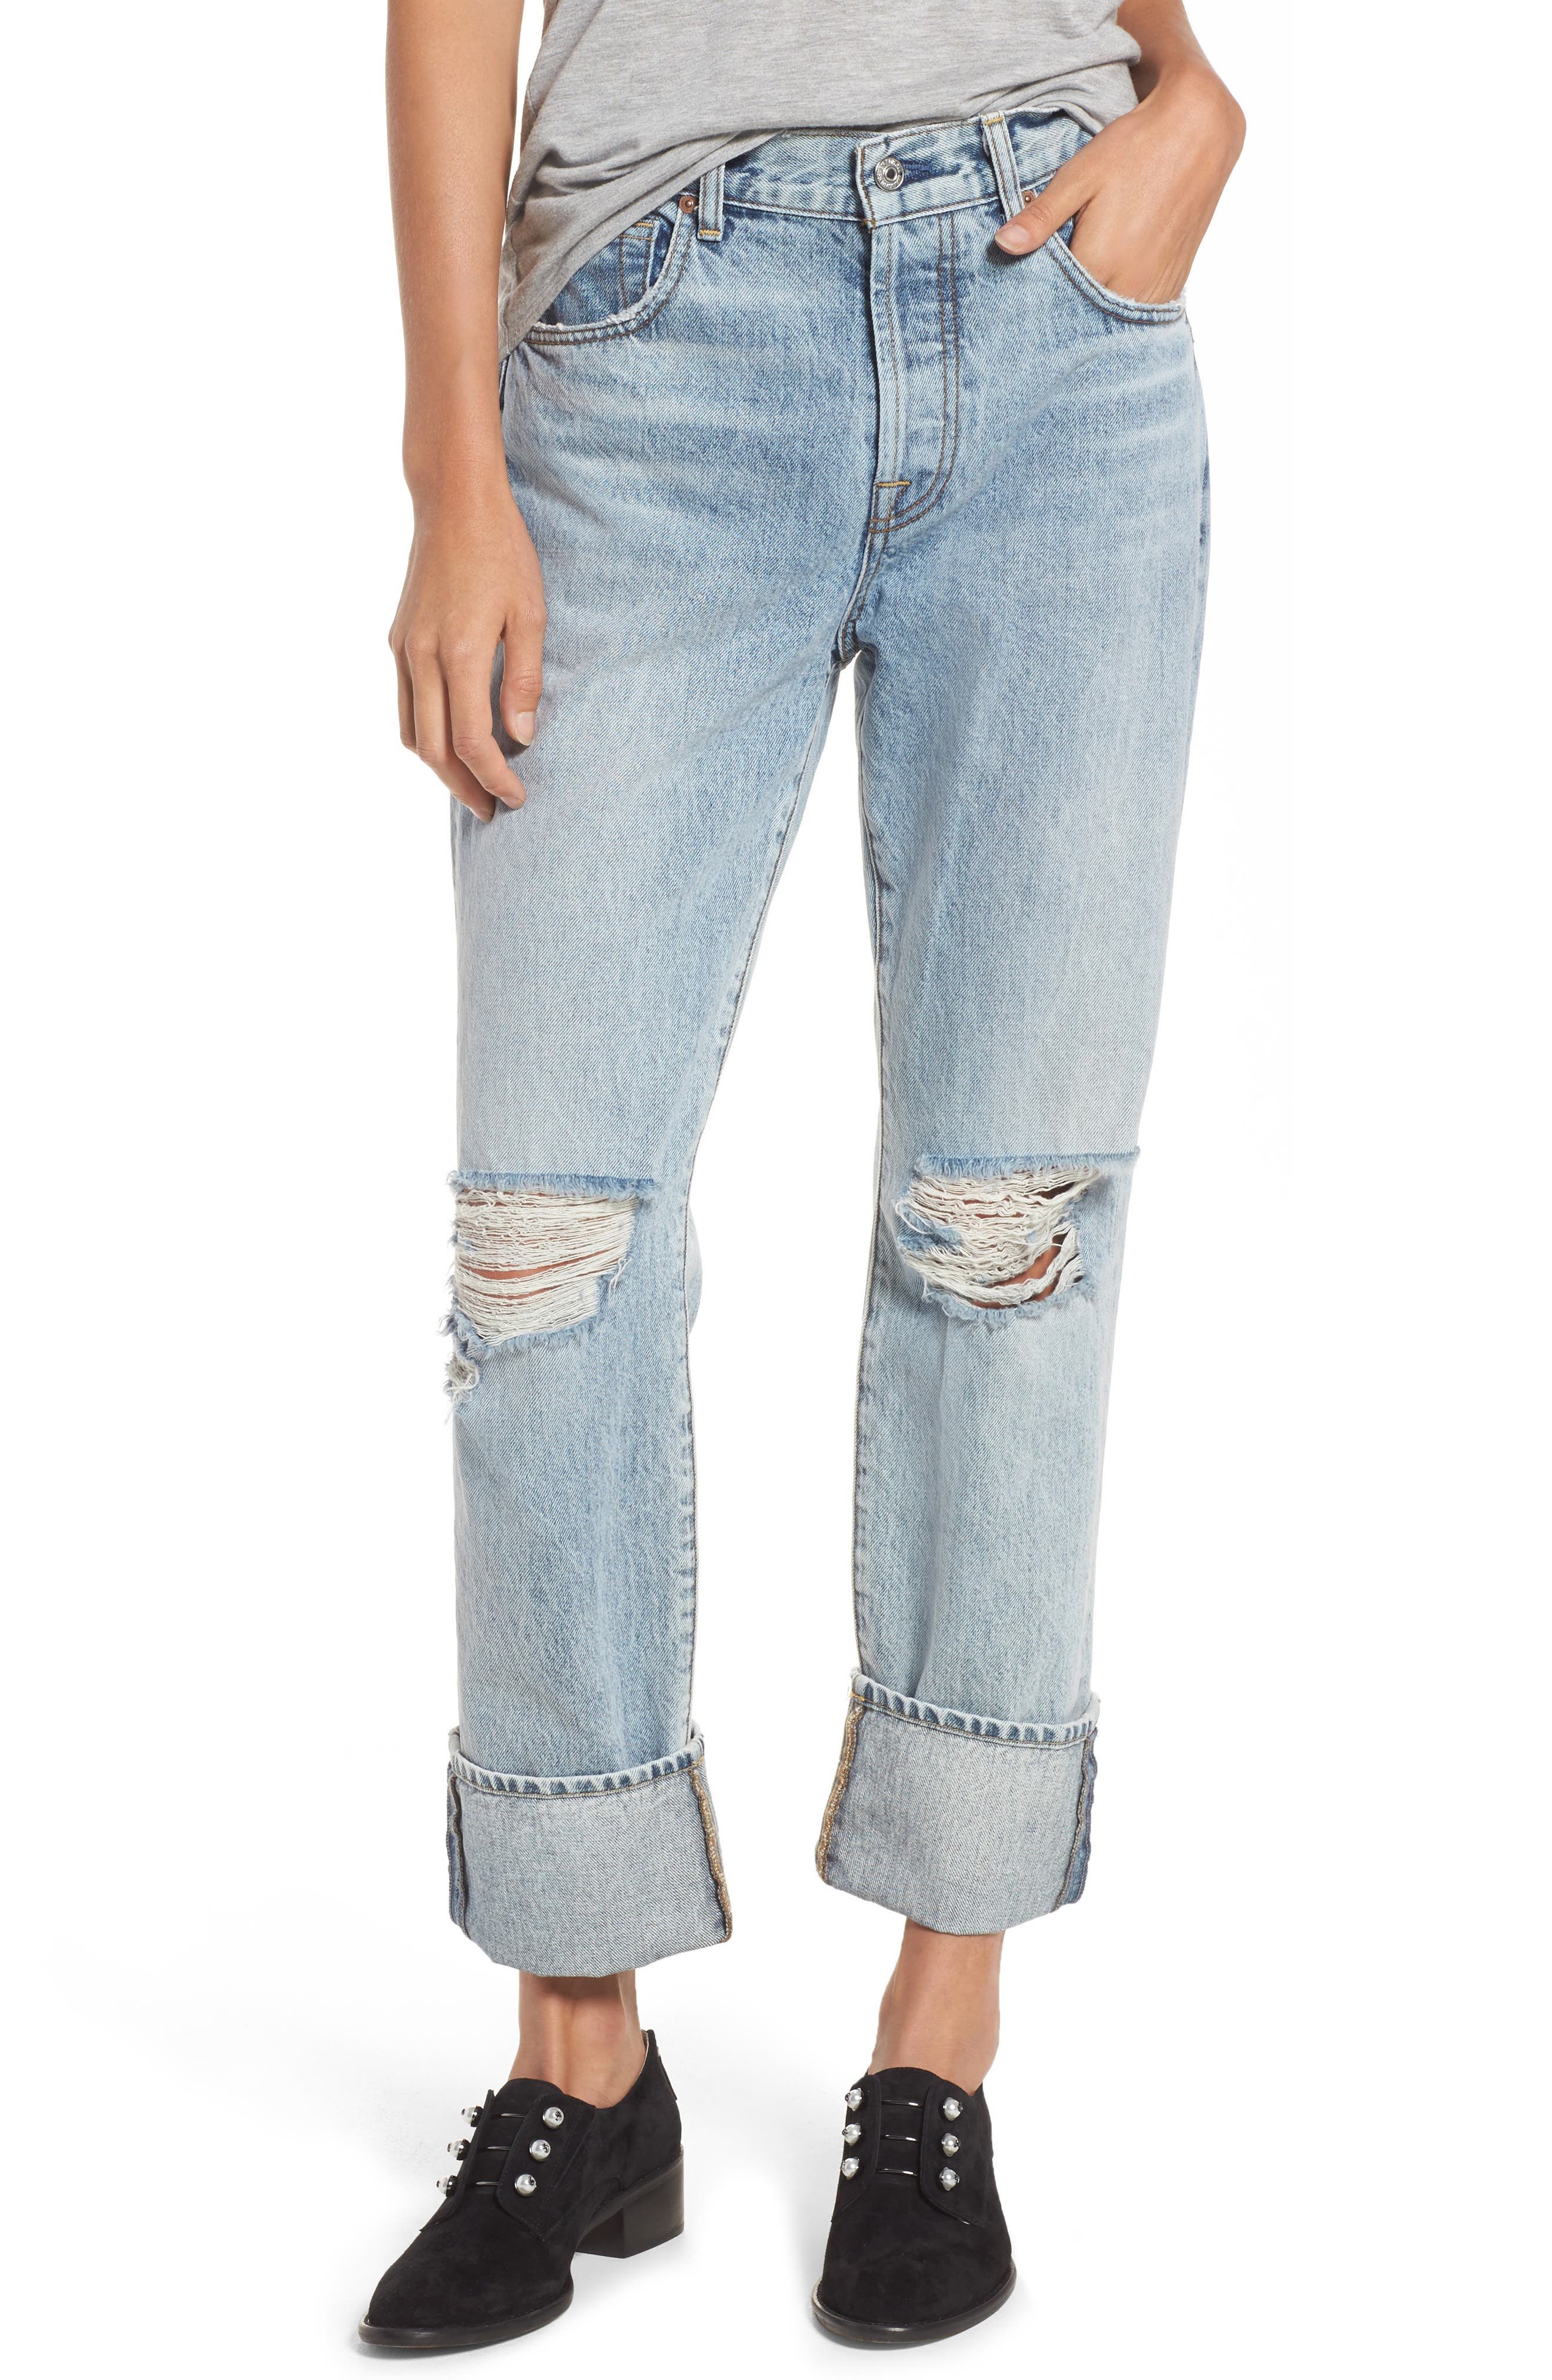 Rickie High Waist Boyfriend Jeans,                         Main,                         color, Mineral Desert Springs 3